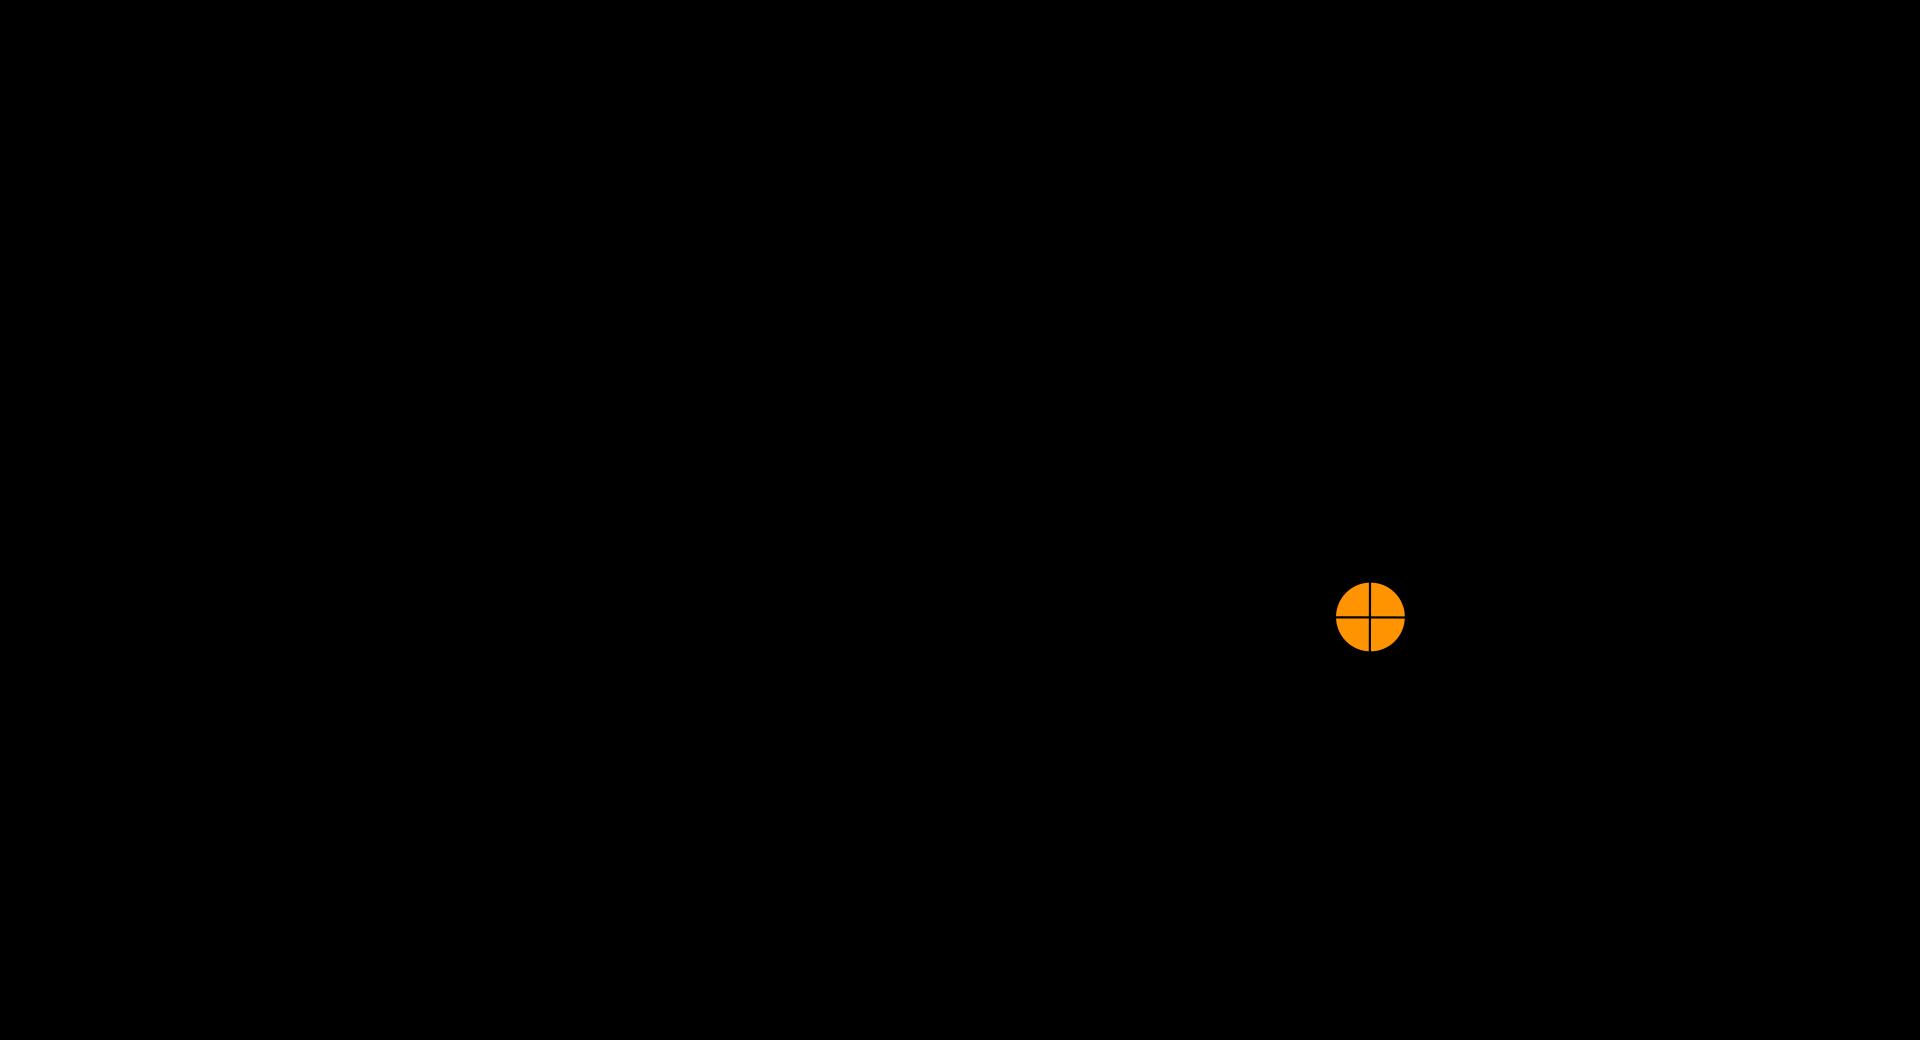 1920px-Wadley-loop_FRG-7_svg.png